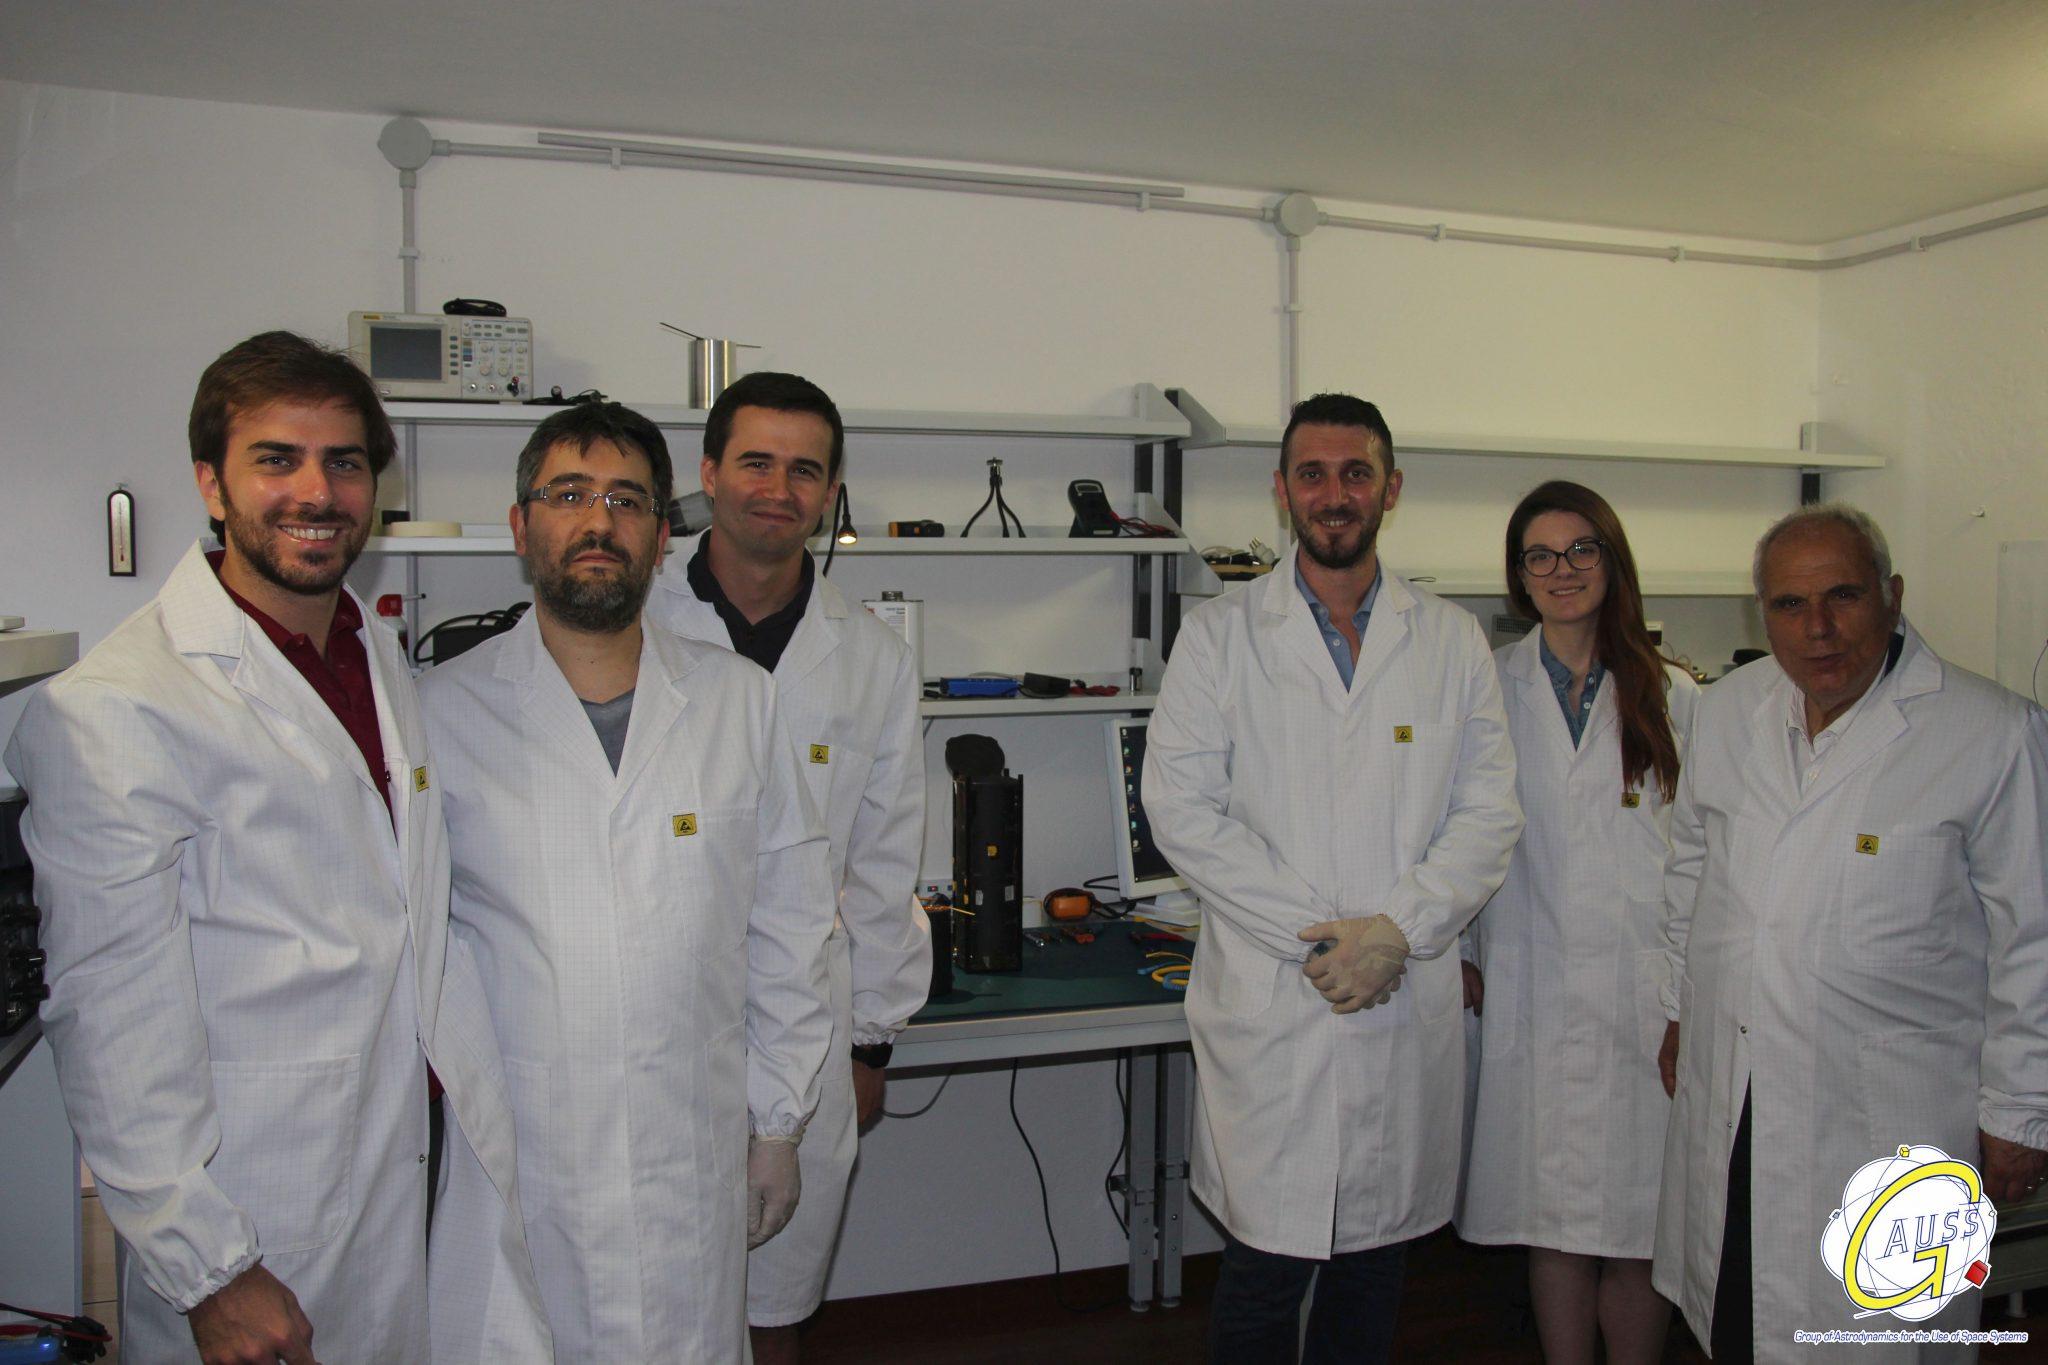 GAUSS Srlのエンジニアたち。社長のフィリッポ教授(右)と(©GAUSS Srl)